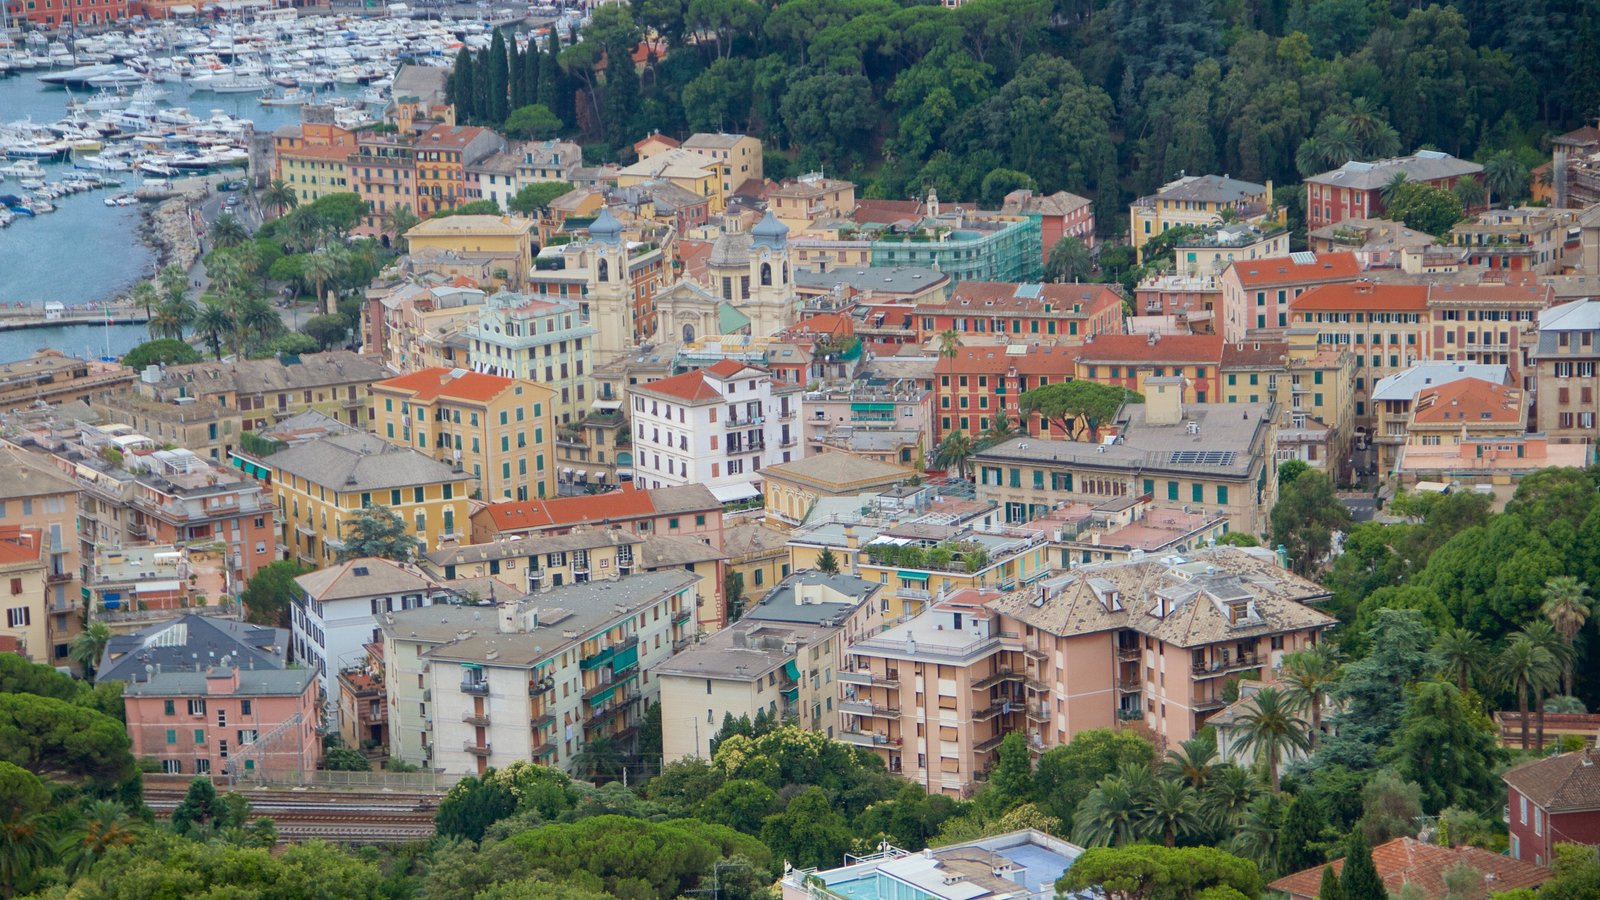 Portofino showing general coastal views, a city and a coastal town